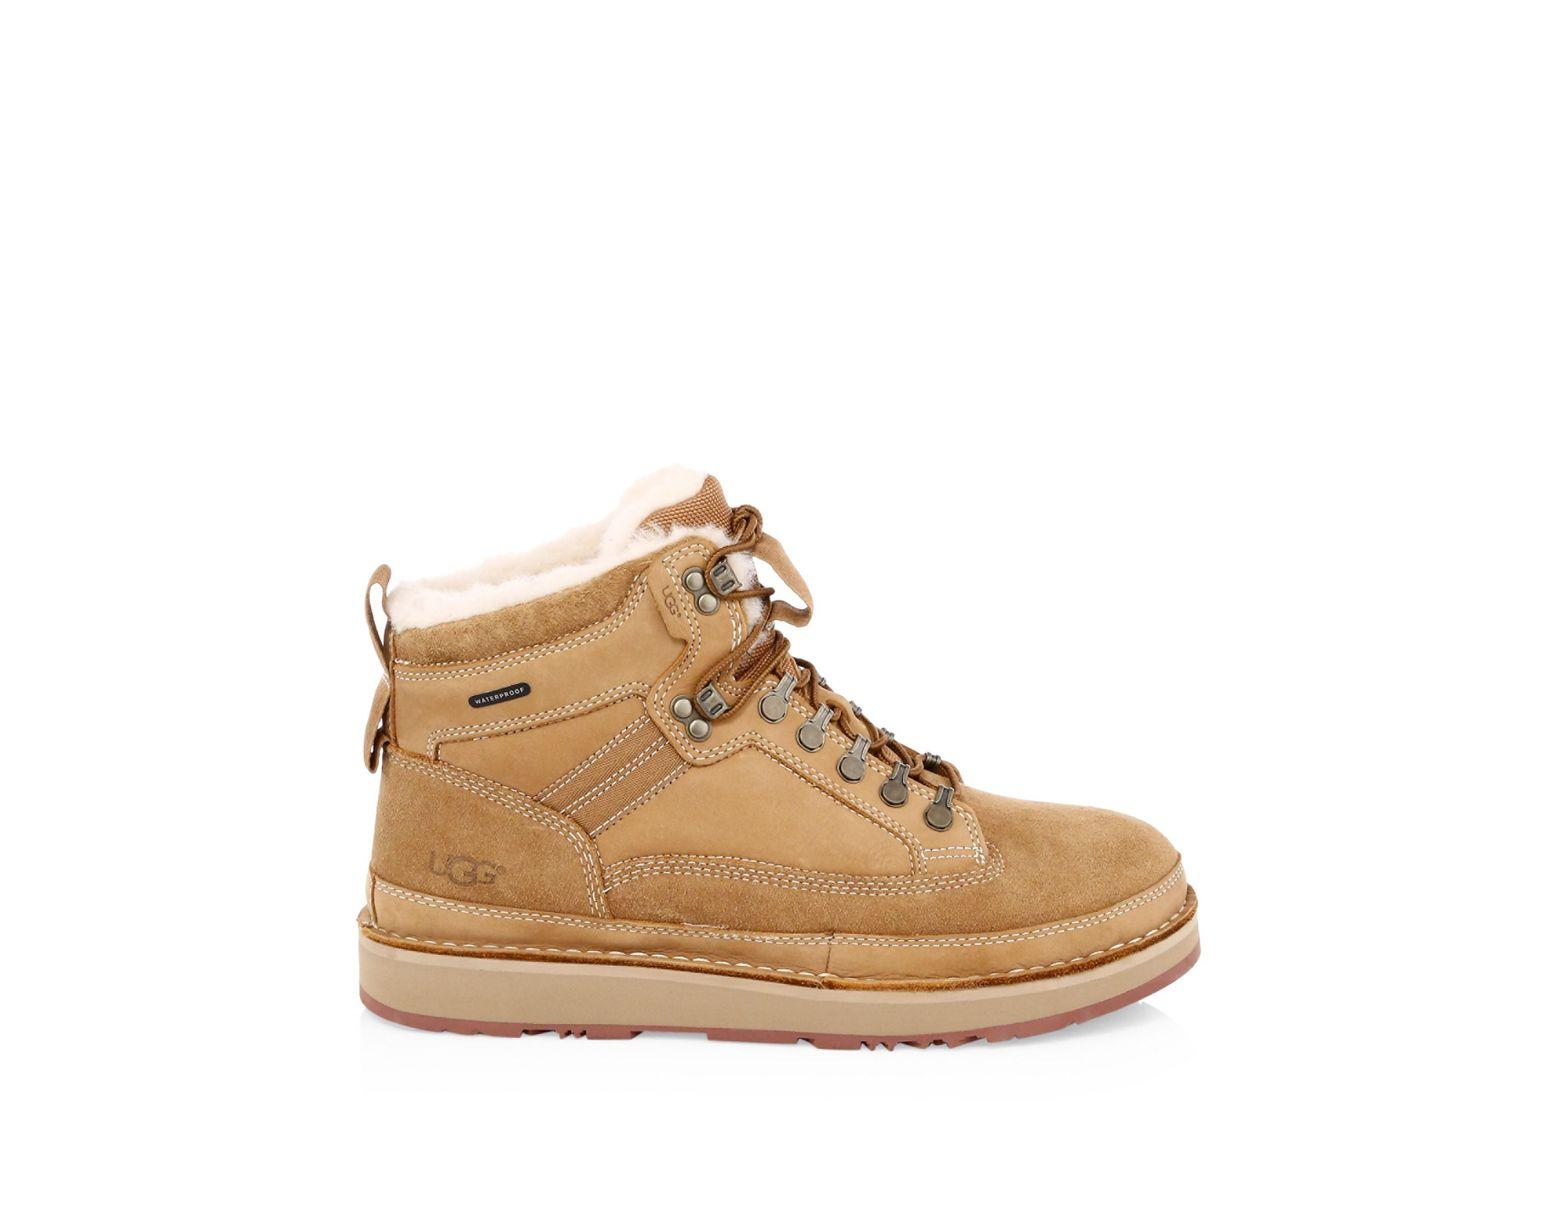 fbf97ca4f9e Men's Brown Avalanche Hiker Suede & Shearling Boots